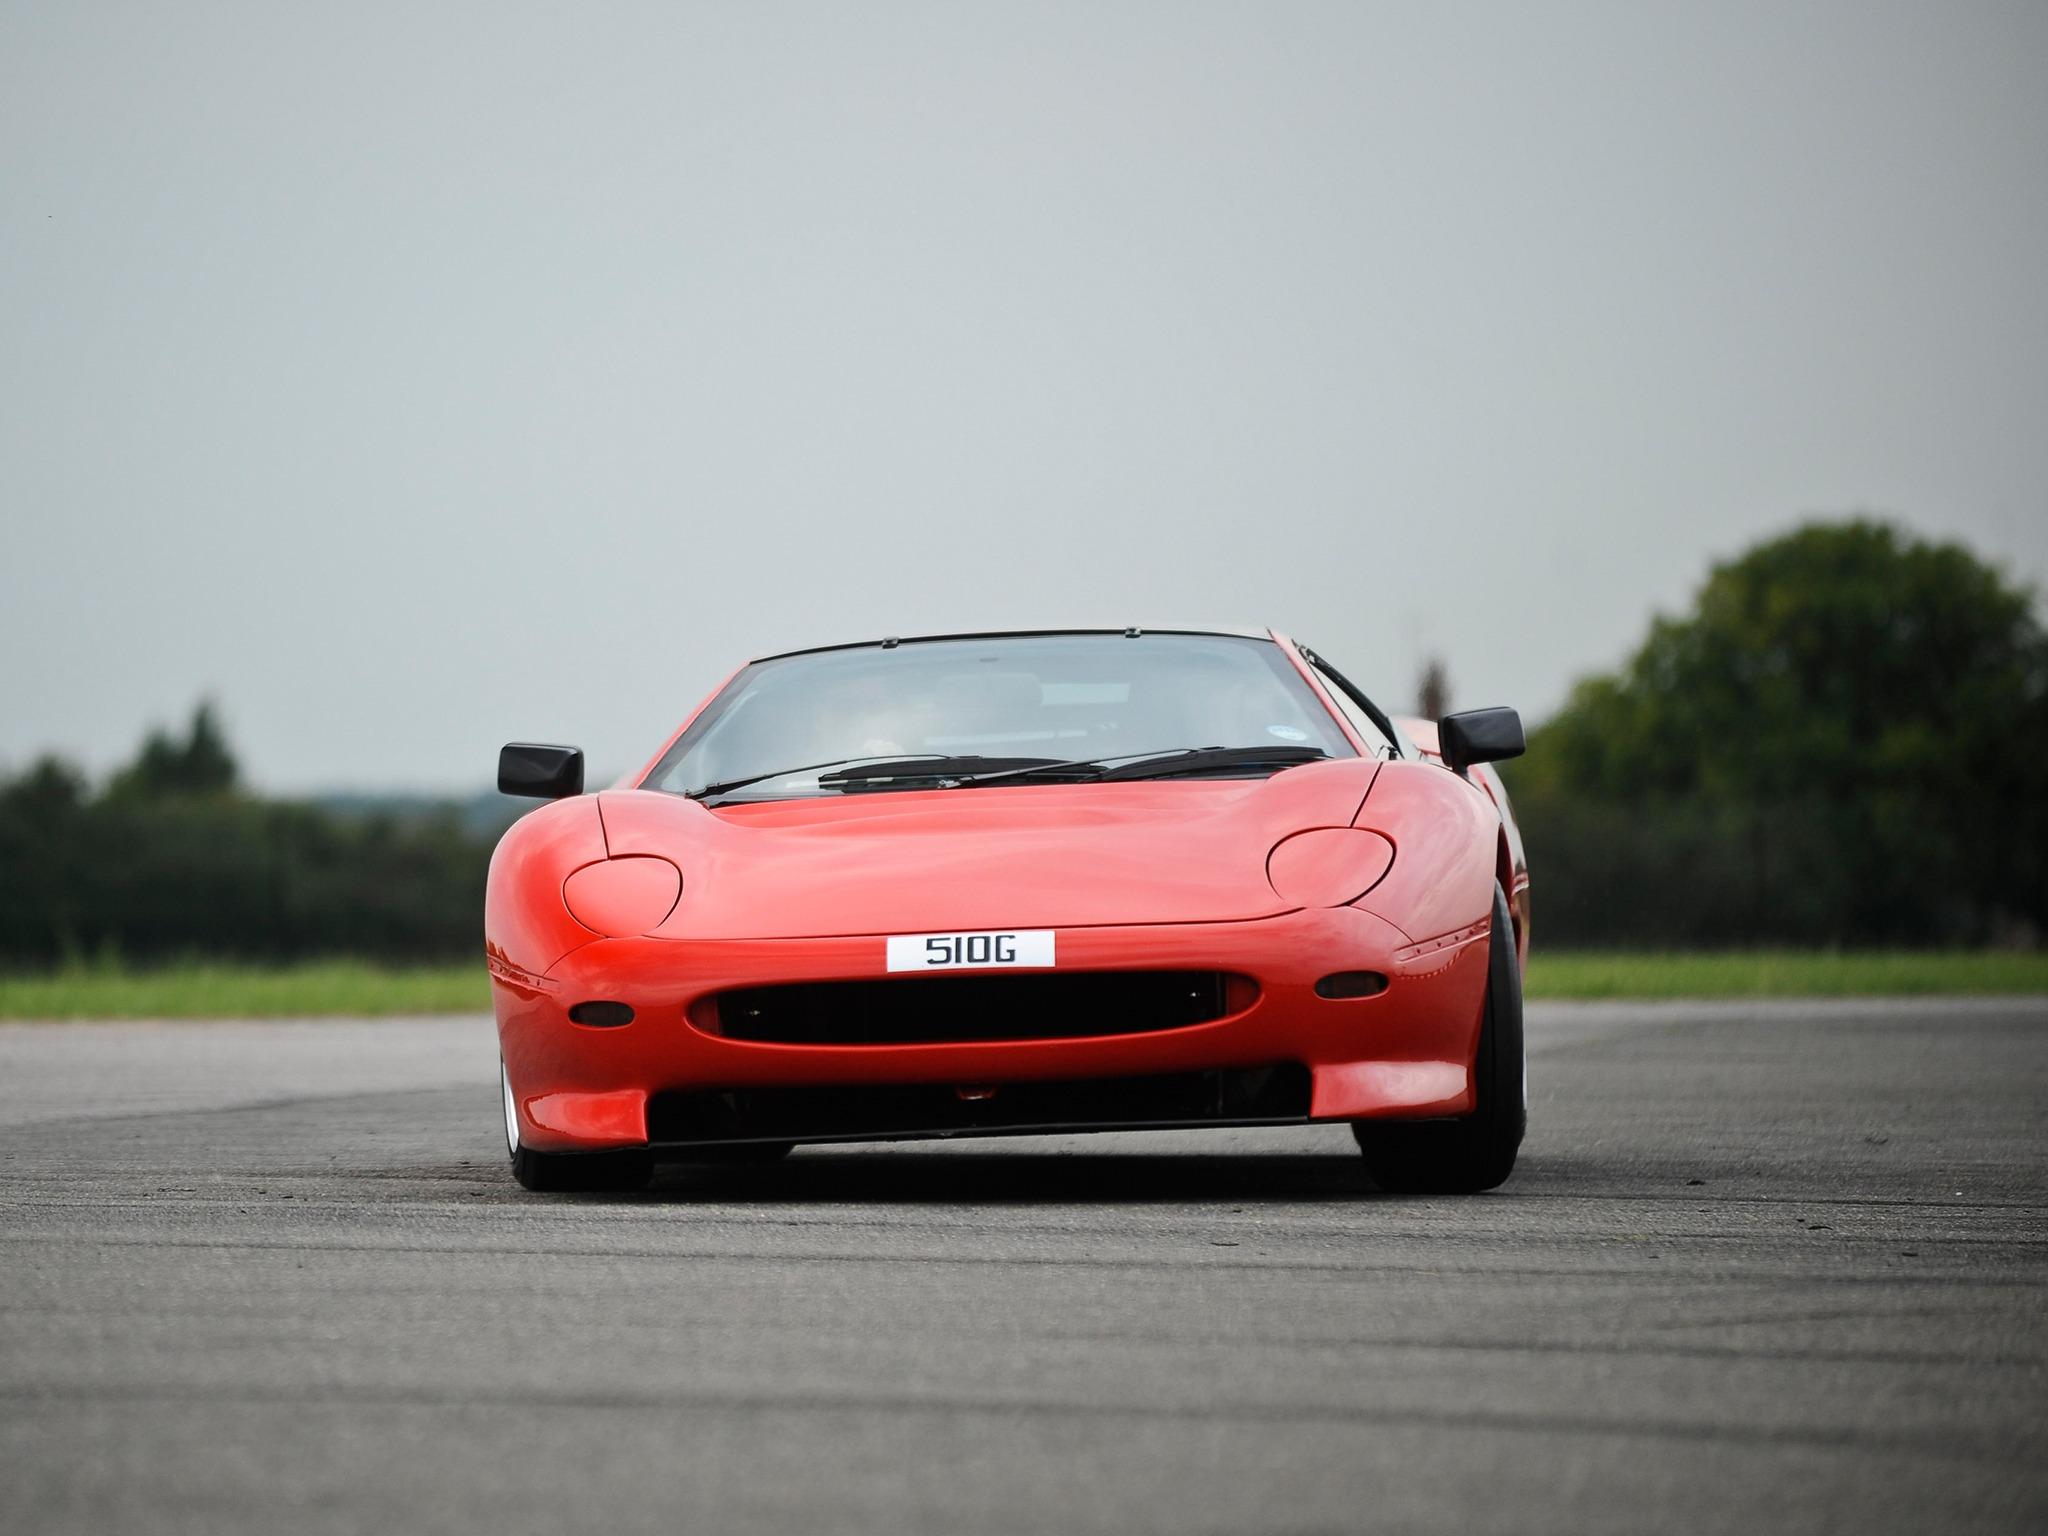 Top 10 Fastest Cars >> Jaguar XJ220 Concept & Prototype (1988-1990) - Old Concept Cars